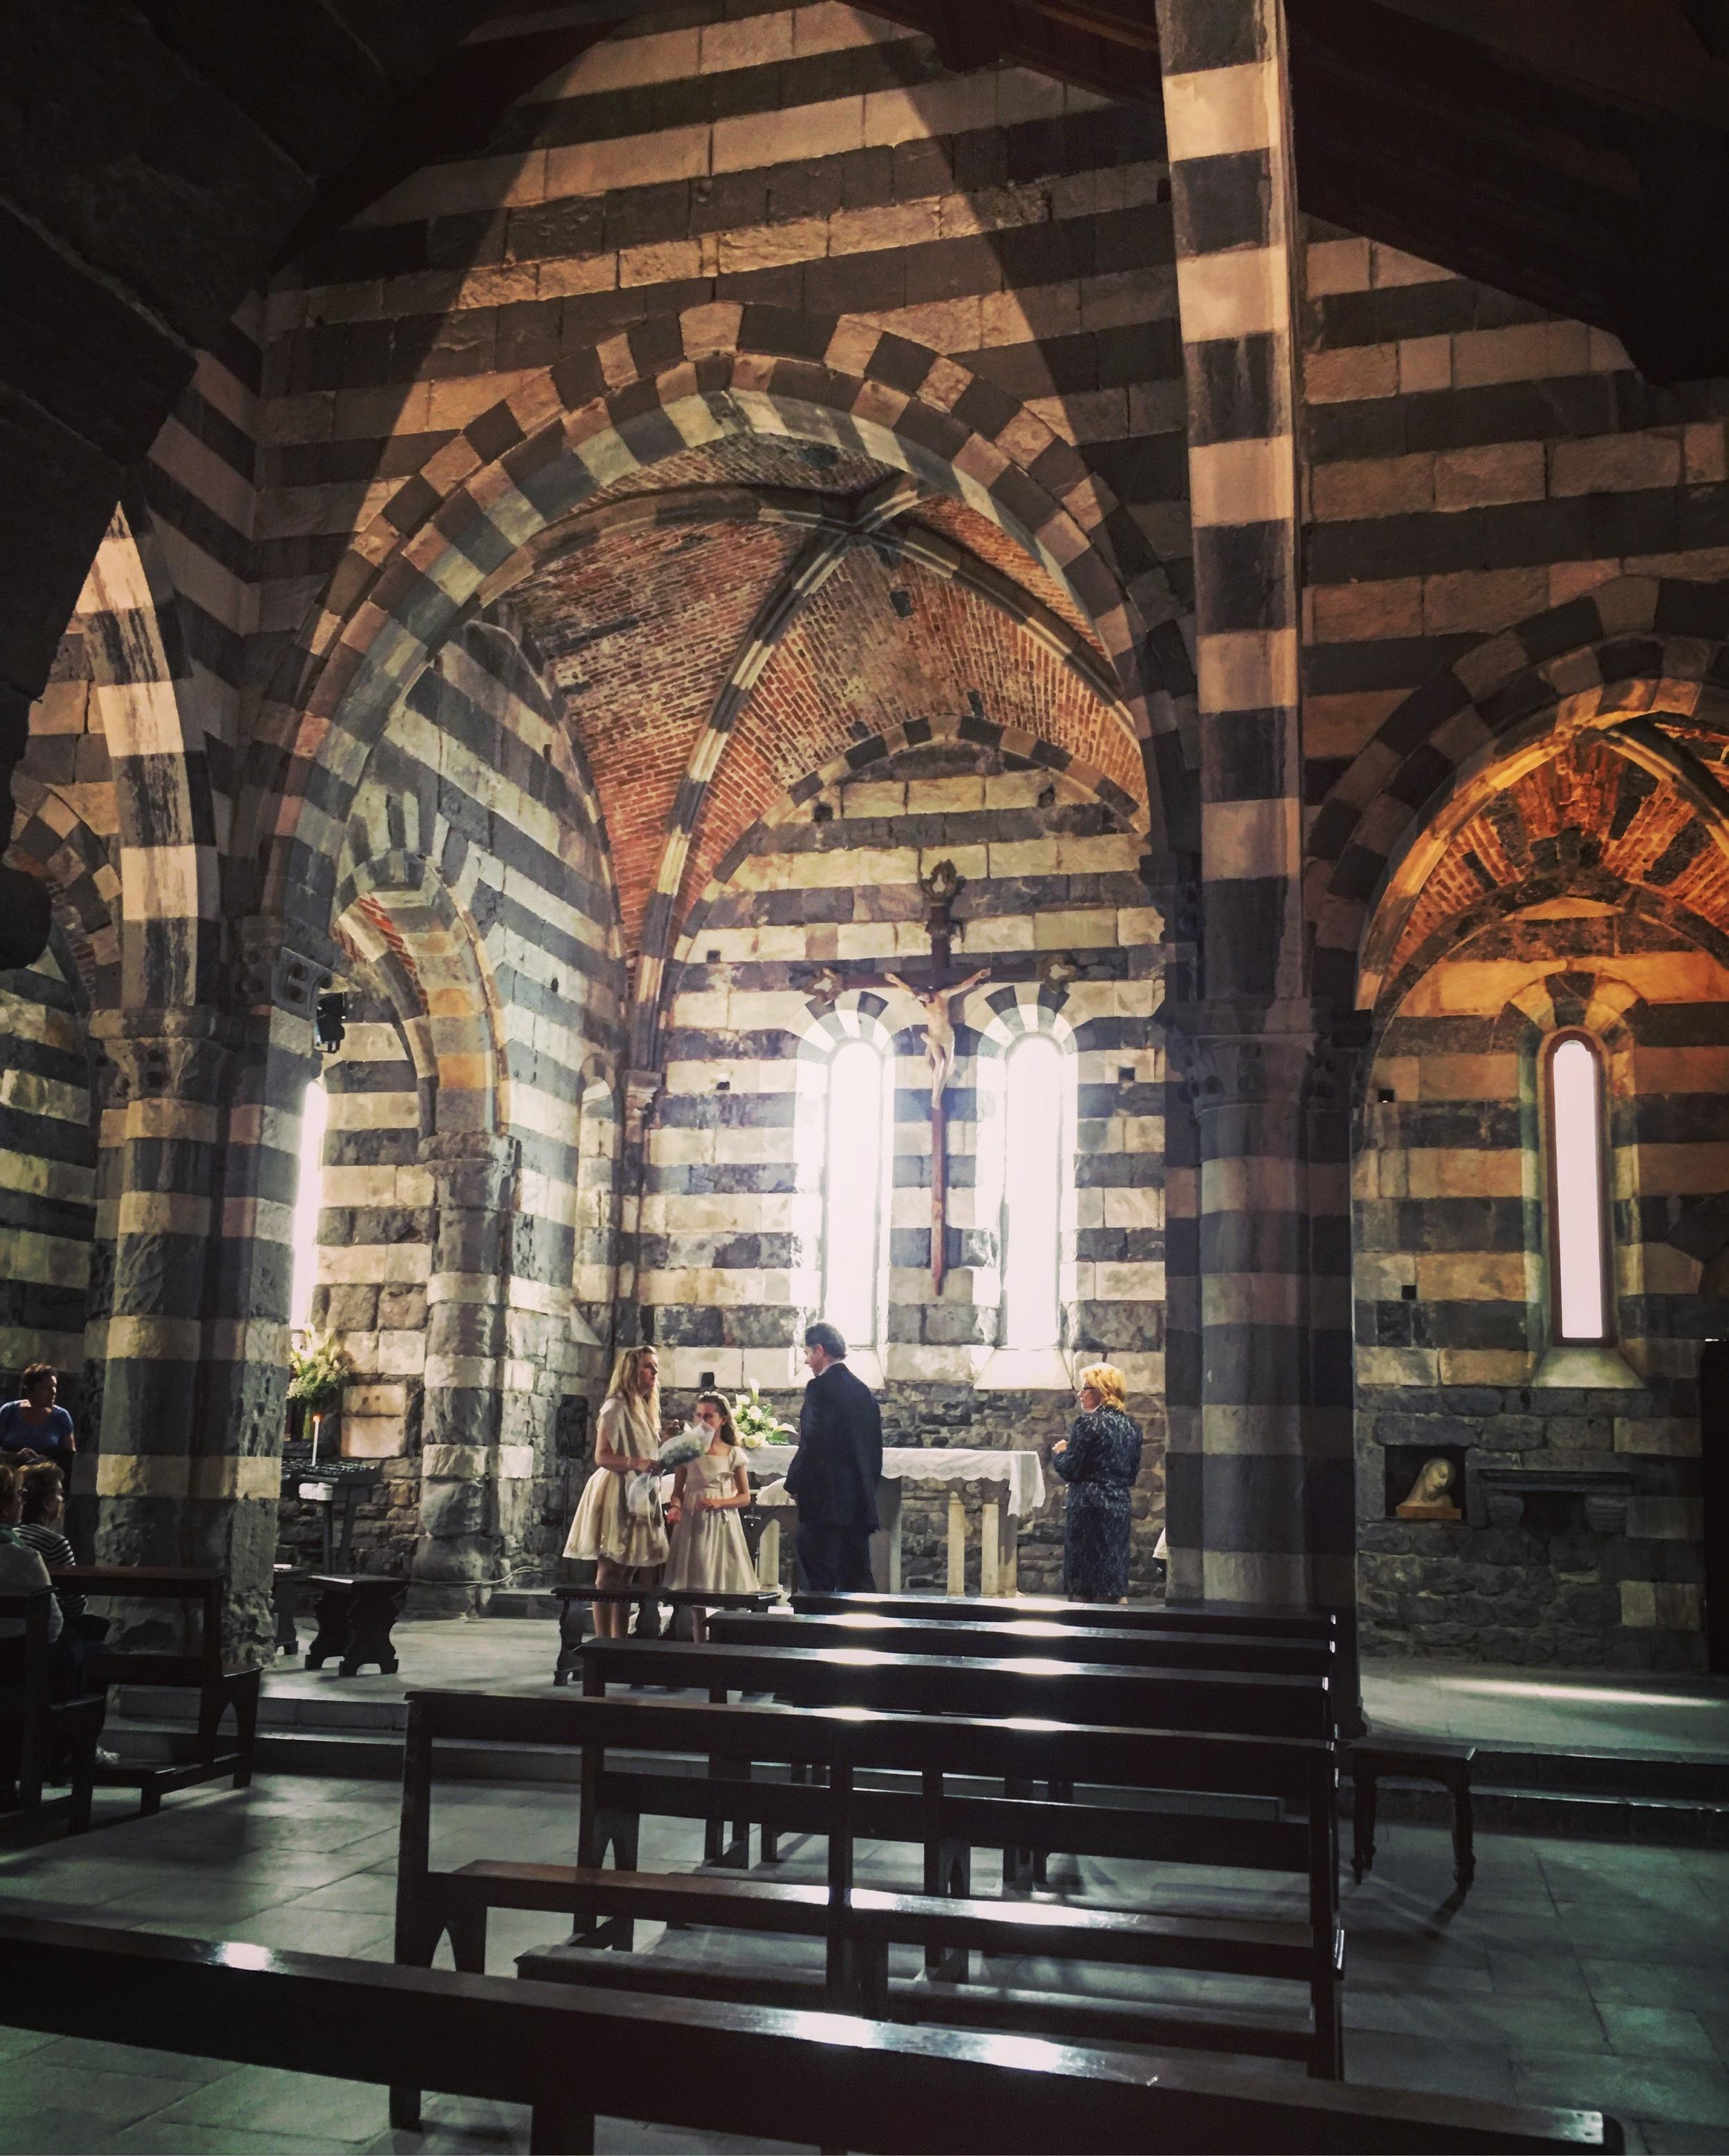 The interior of San Pietro Church